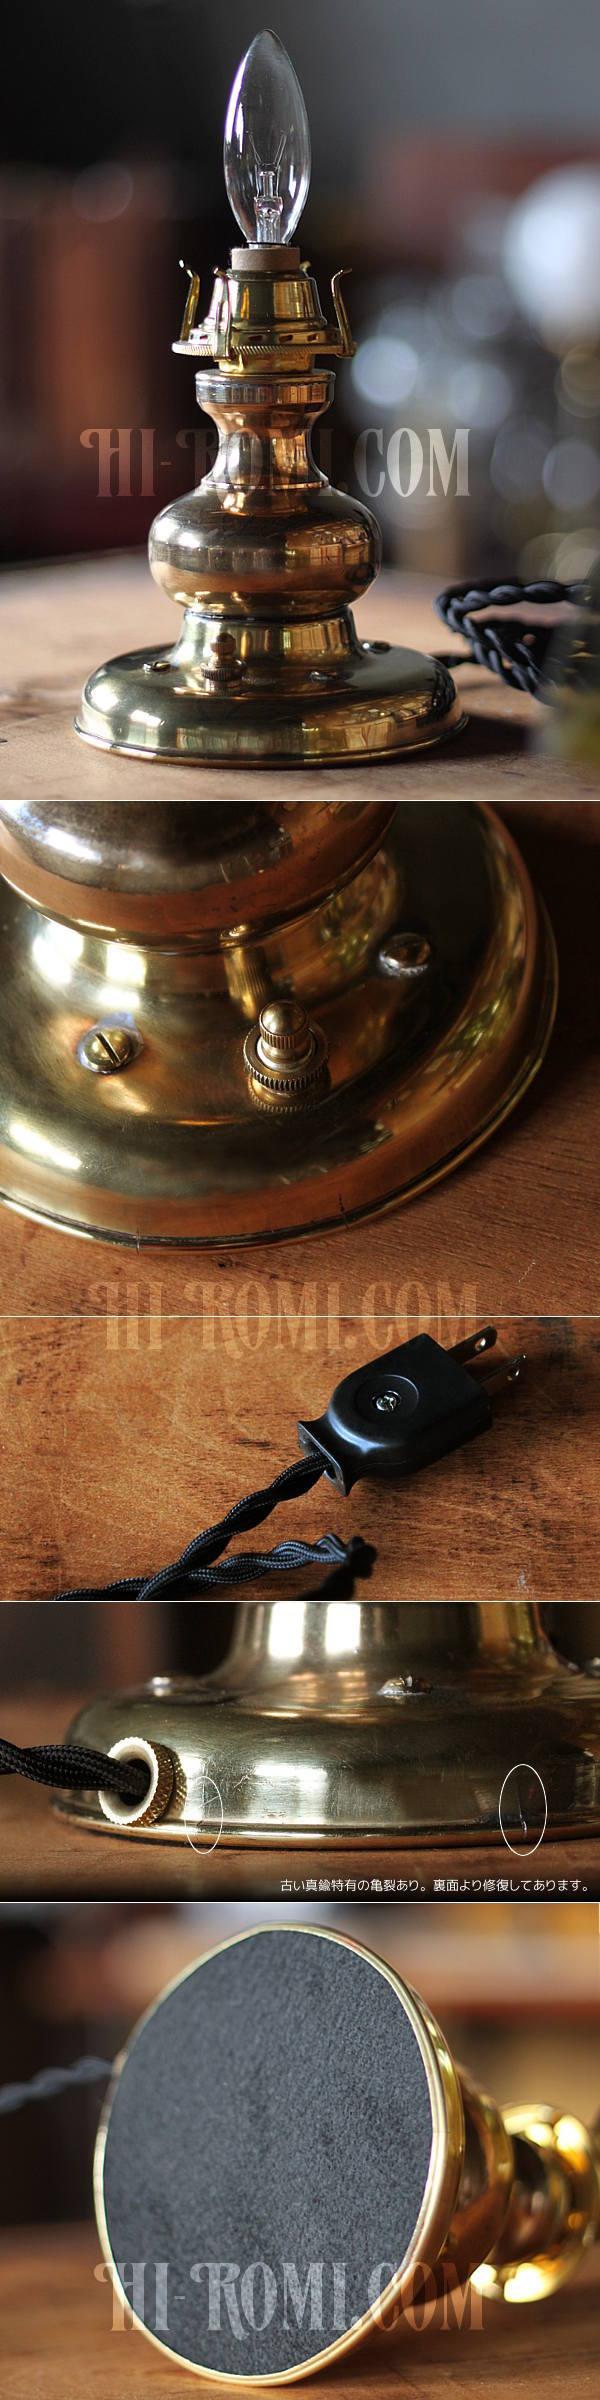 USAヴィンテージコロニアルイエローグリーンガラスシェード付真鍮製ハリーケーンテーブルランプ/アンティークヴィクトリアン照明